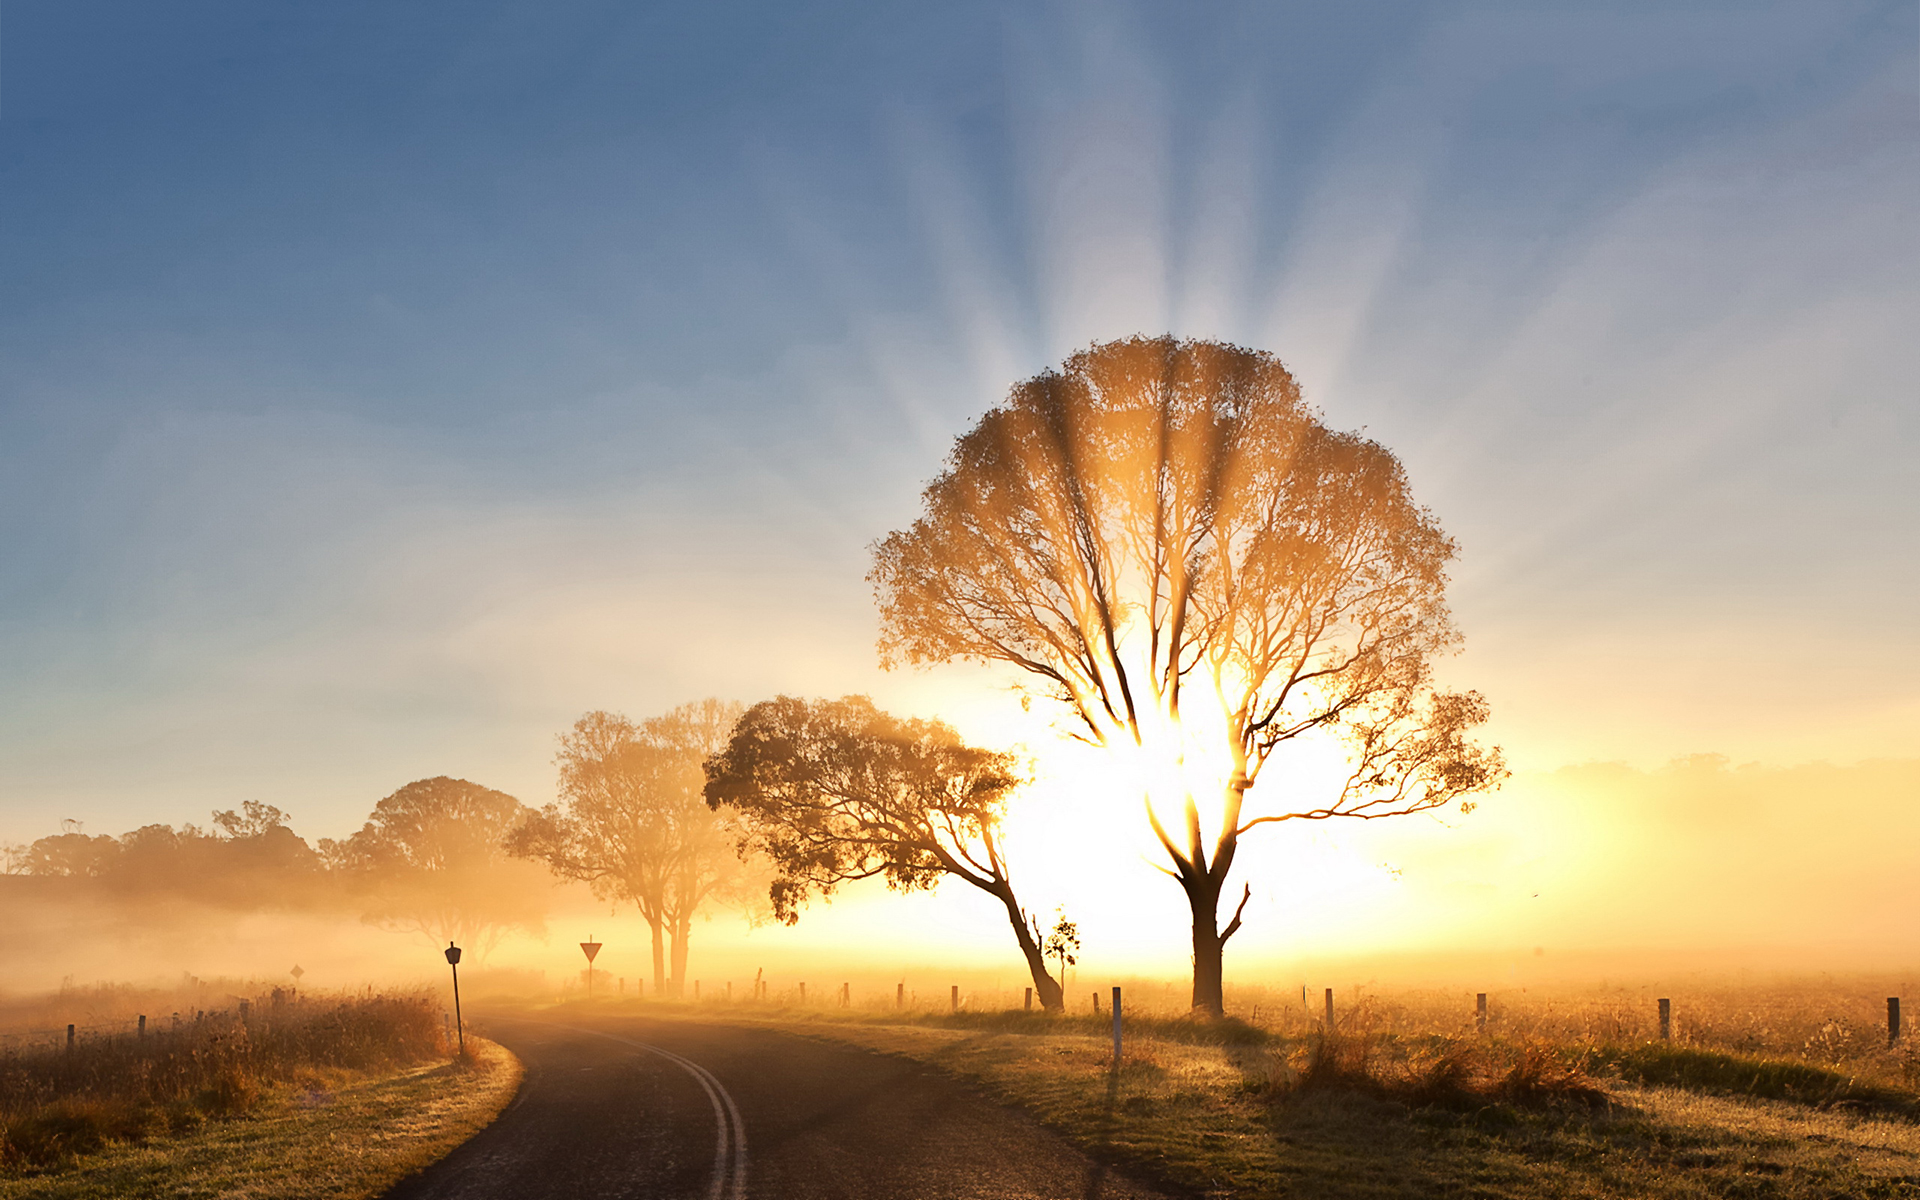 sunrise pictures trees